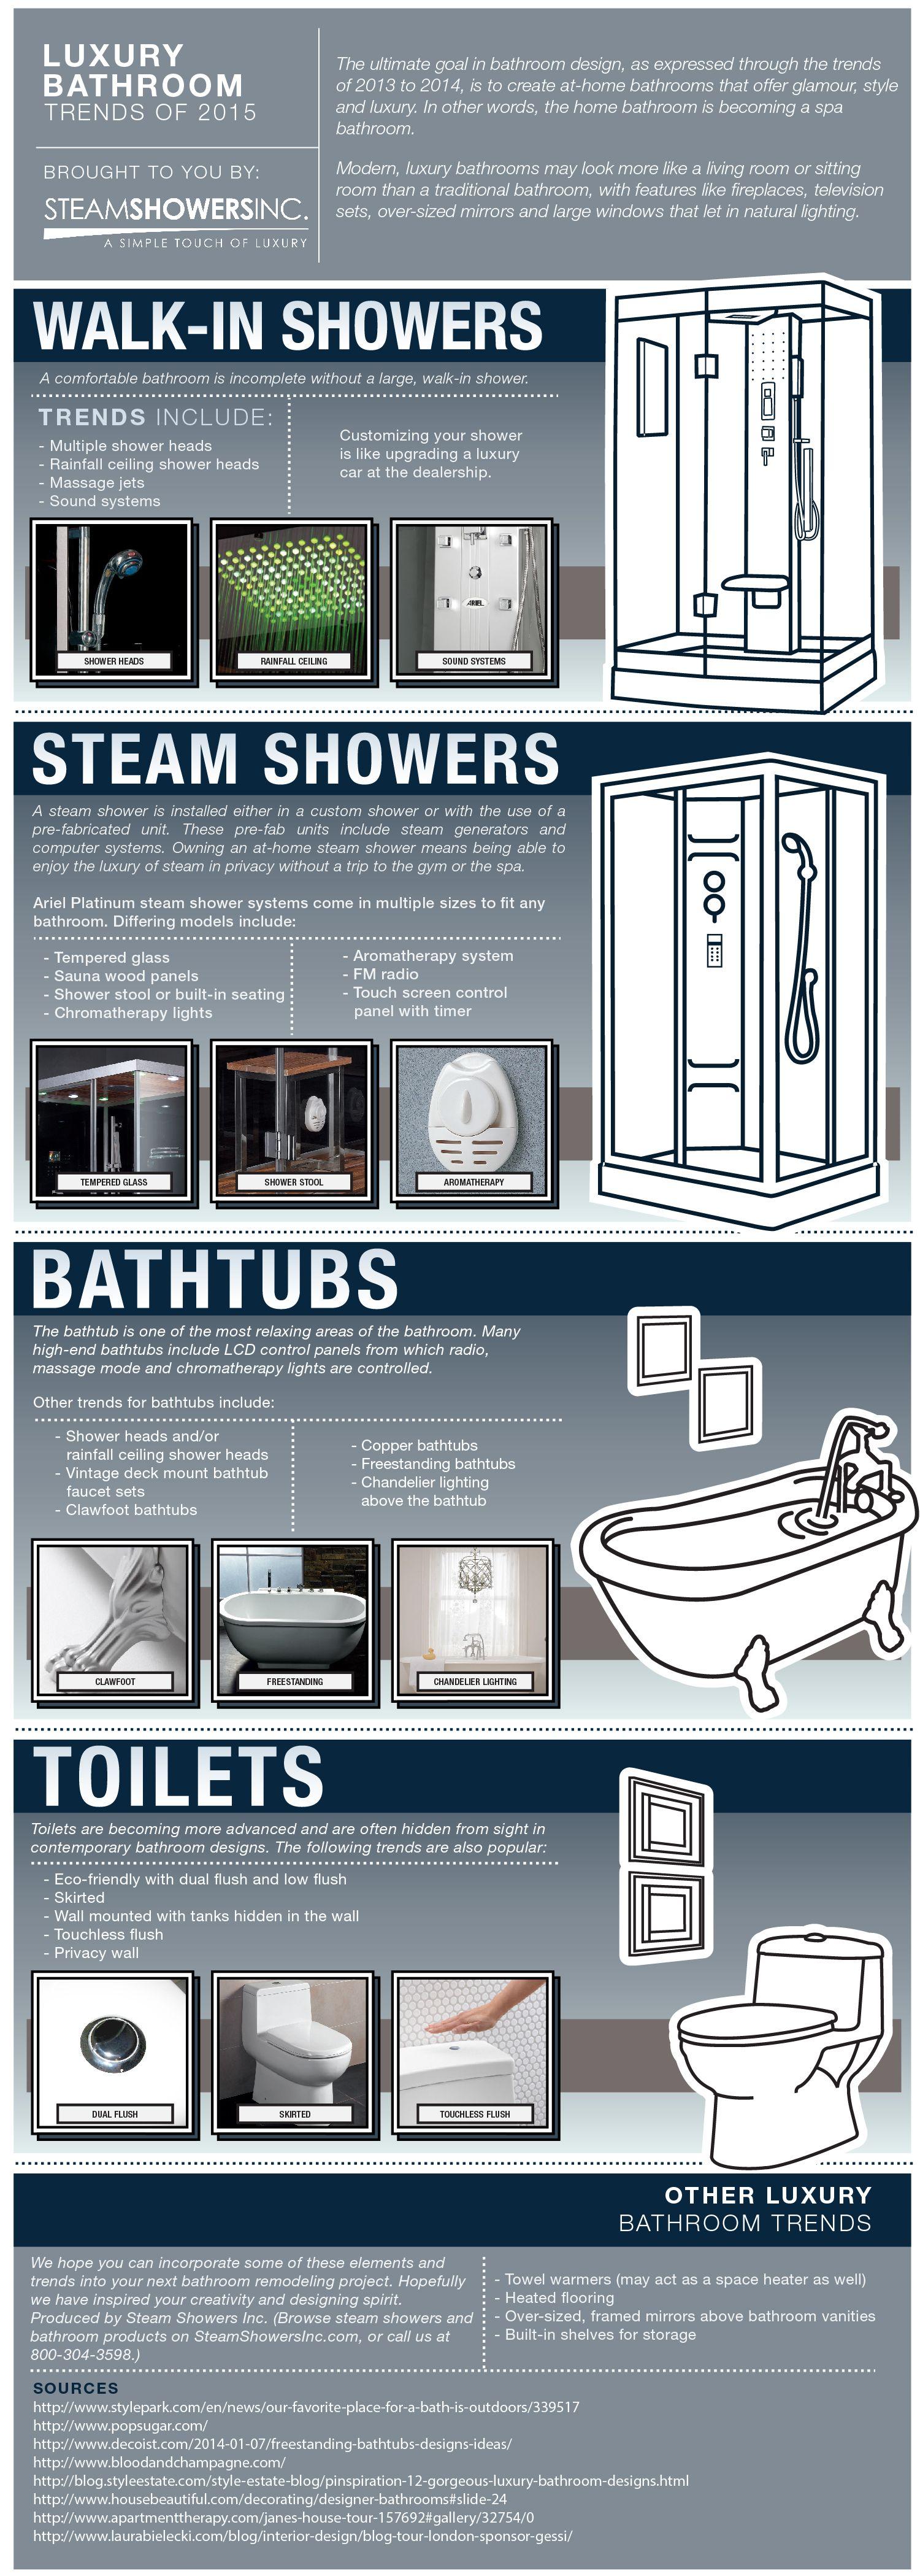 Luxury Bathroom Trends